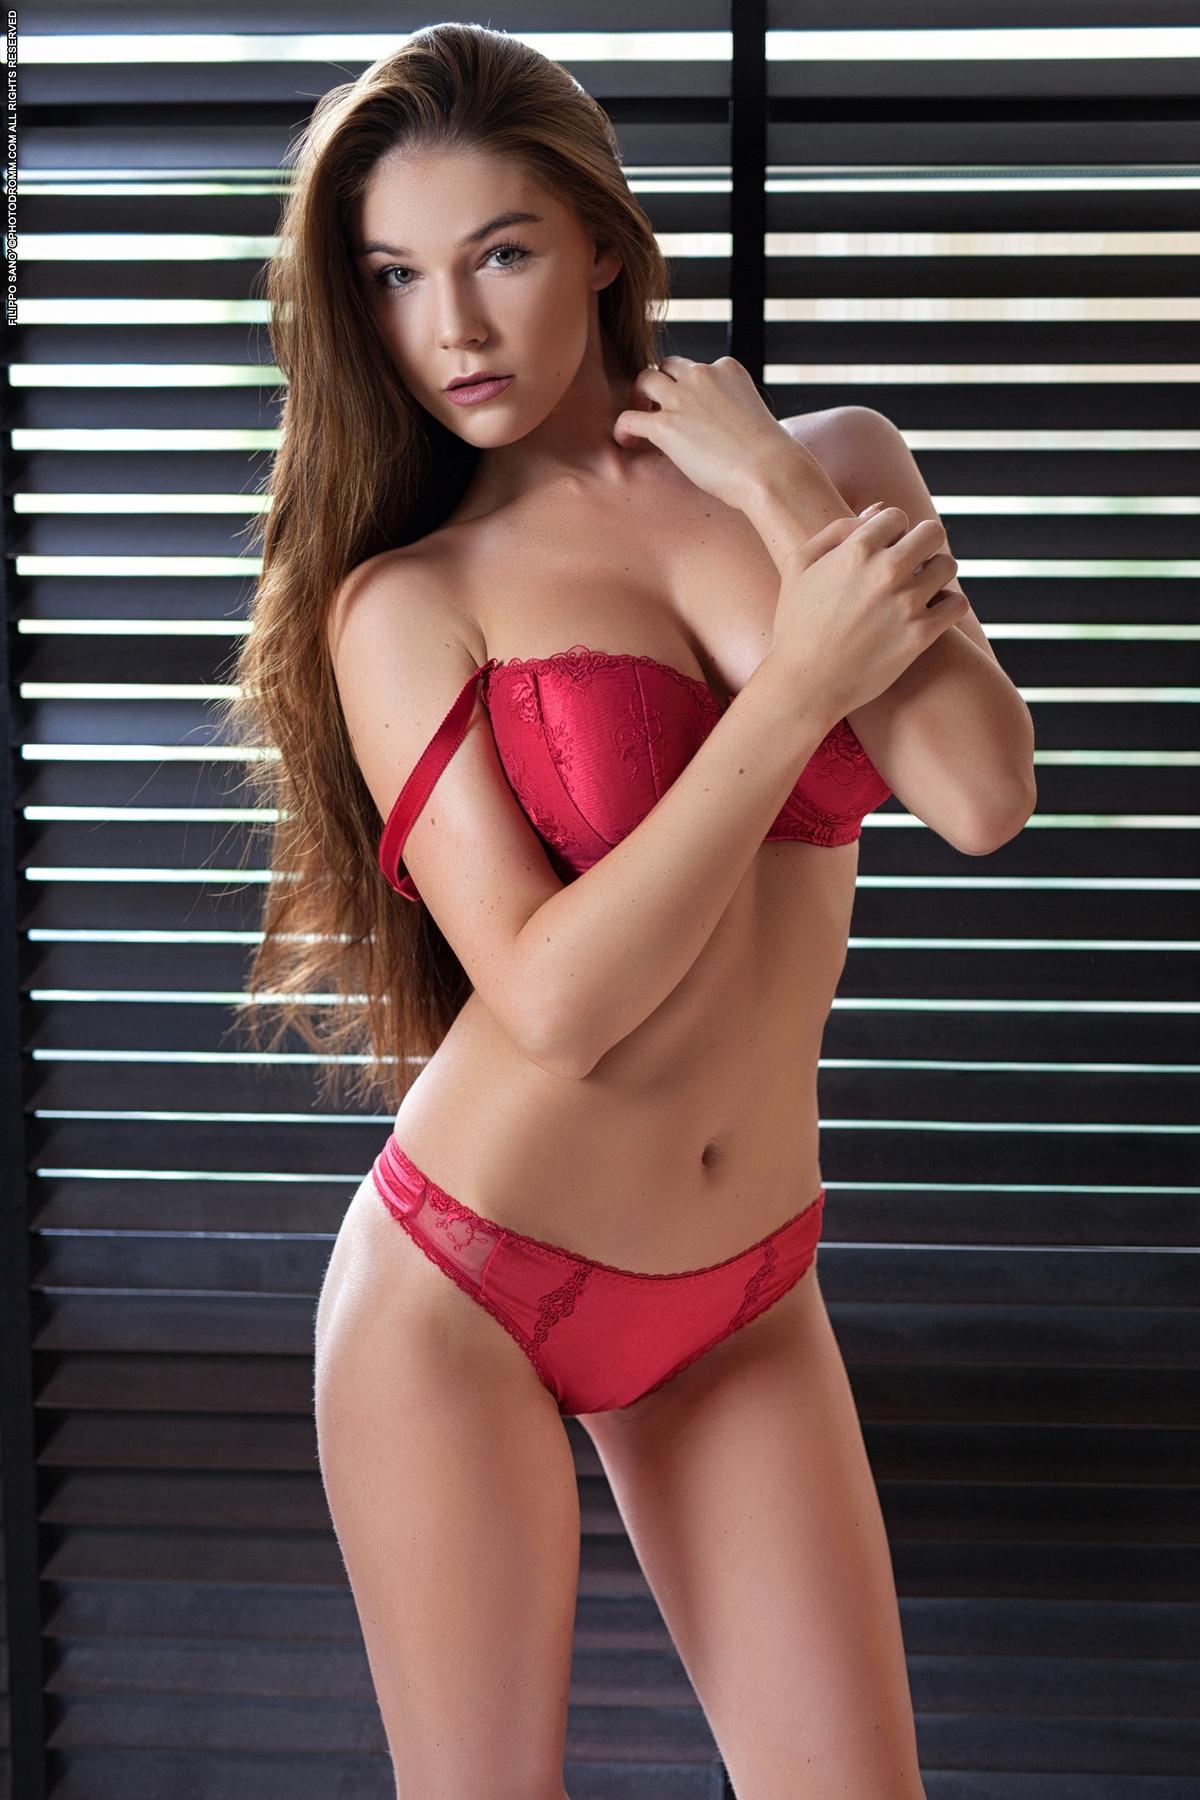 PHOTO   00 435 - Incredibly Hot Busty Angel Loraine